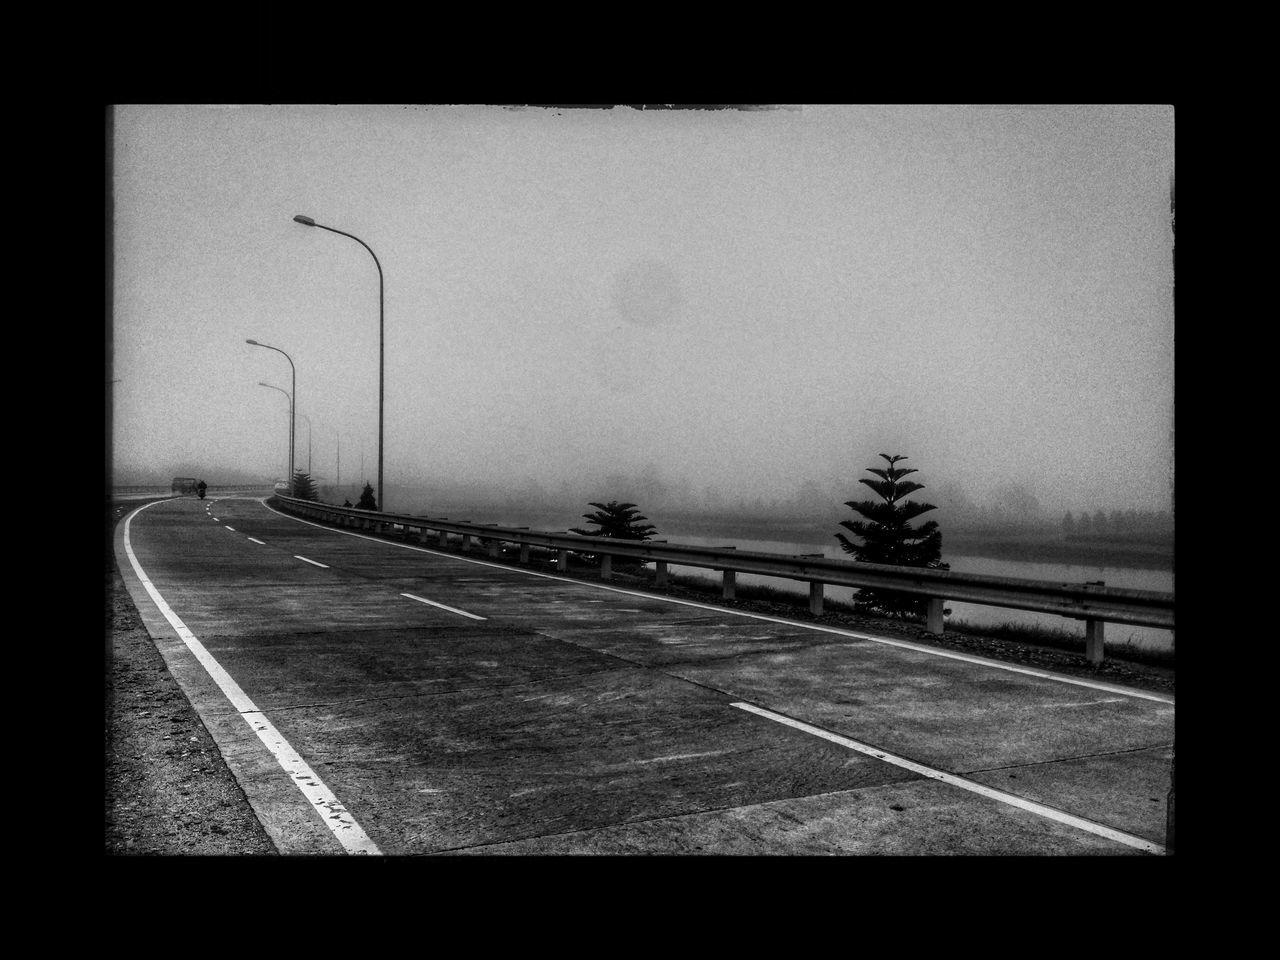 Xperia M4 Aqua XPERIA Streetphotography Streetside Airport Fog Outdoors